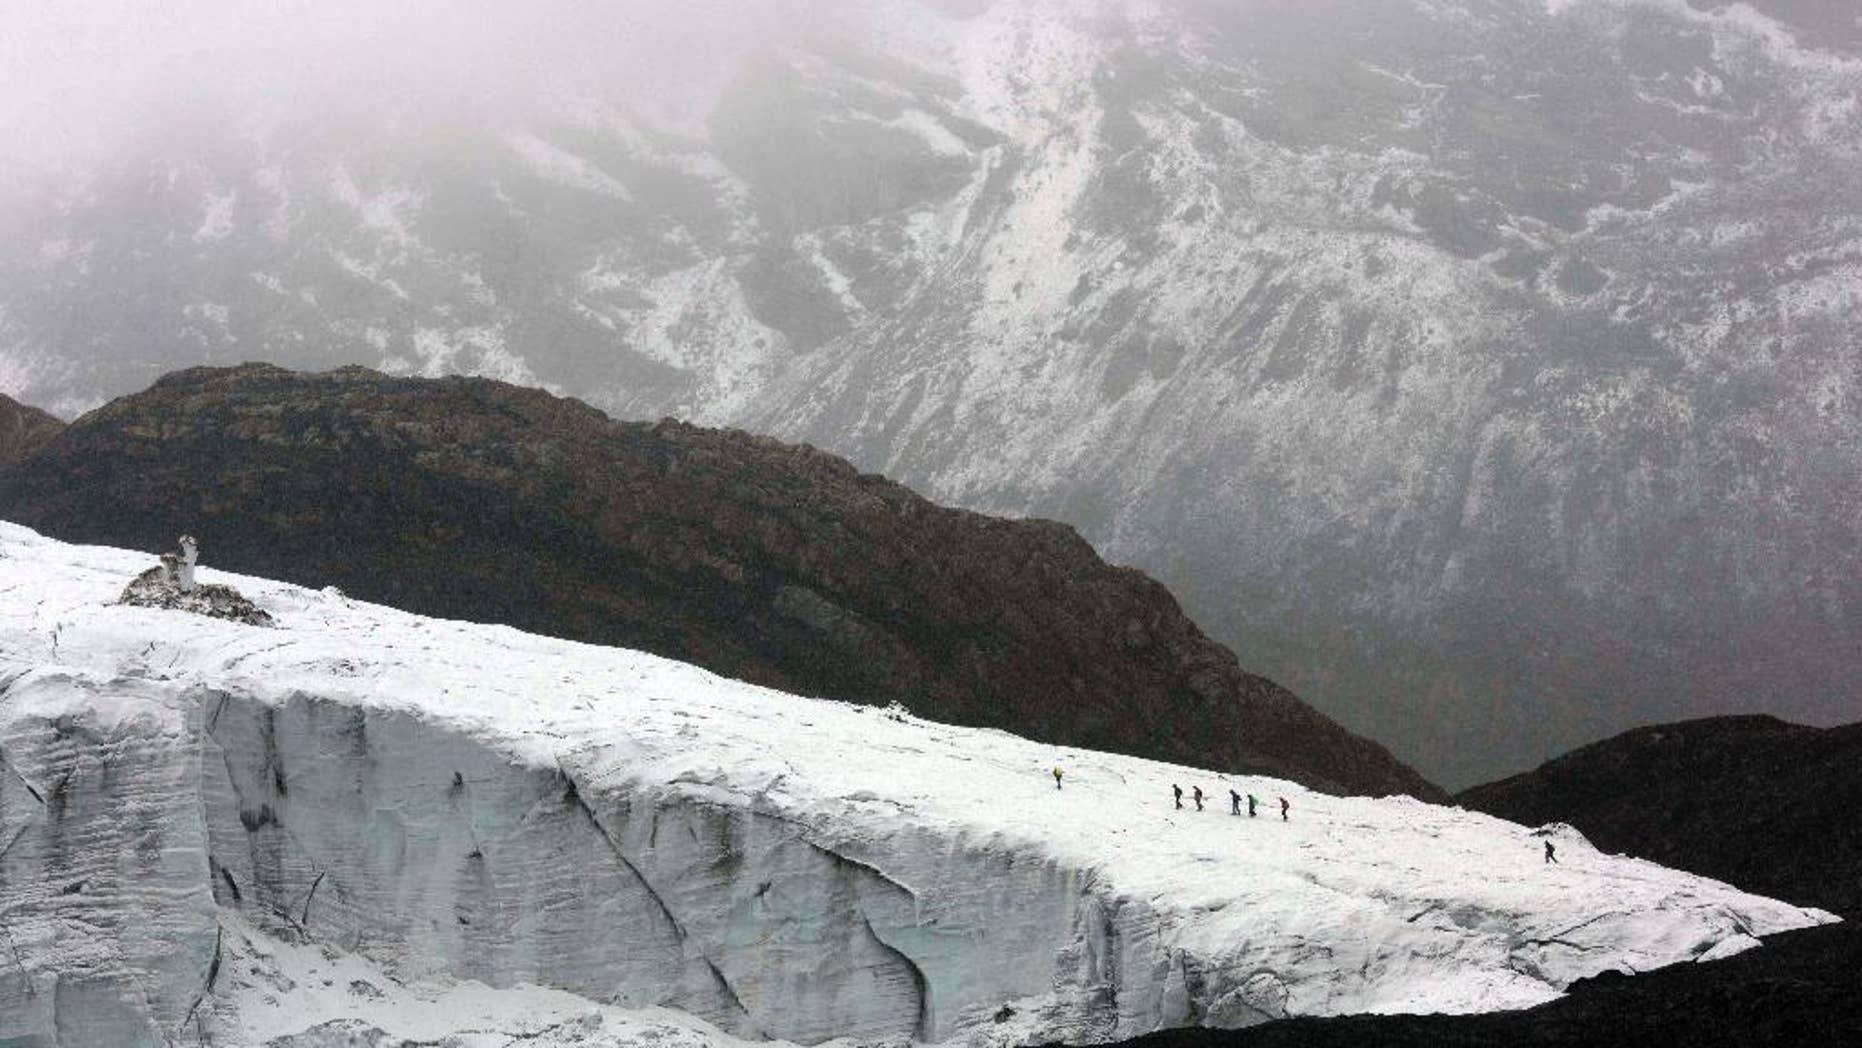 AP10ThingsToSee - Members of the glaciology unit of Peru's national water authority walk on the Pastoruri glacier in Huaraz, Peru, Thursday, Dec. 4, 2014. The glaciology unit is studying the measurement of ice thickness. (AP Photo/Rodrigo Abd)